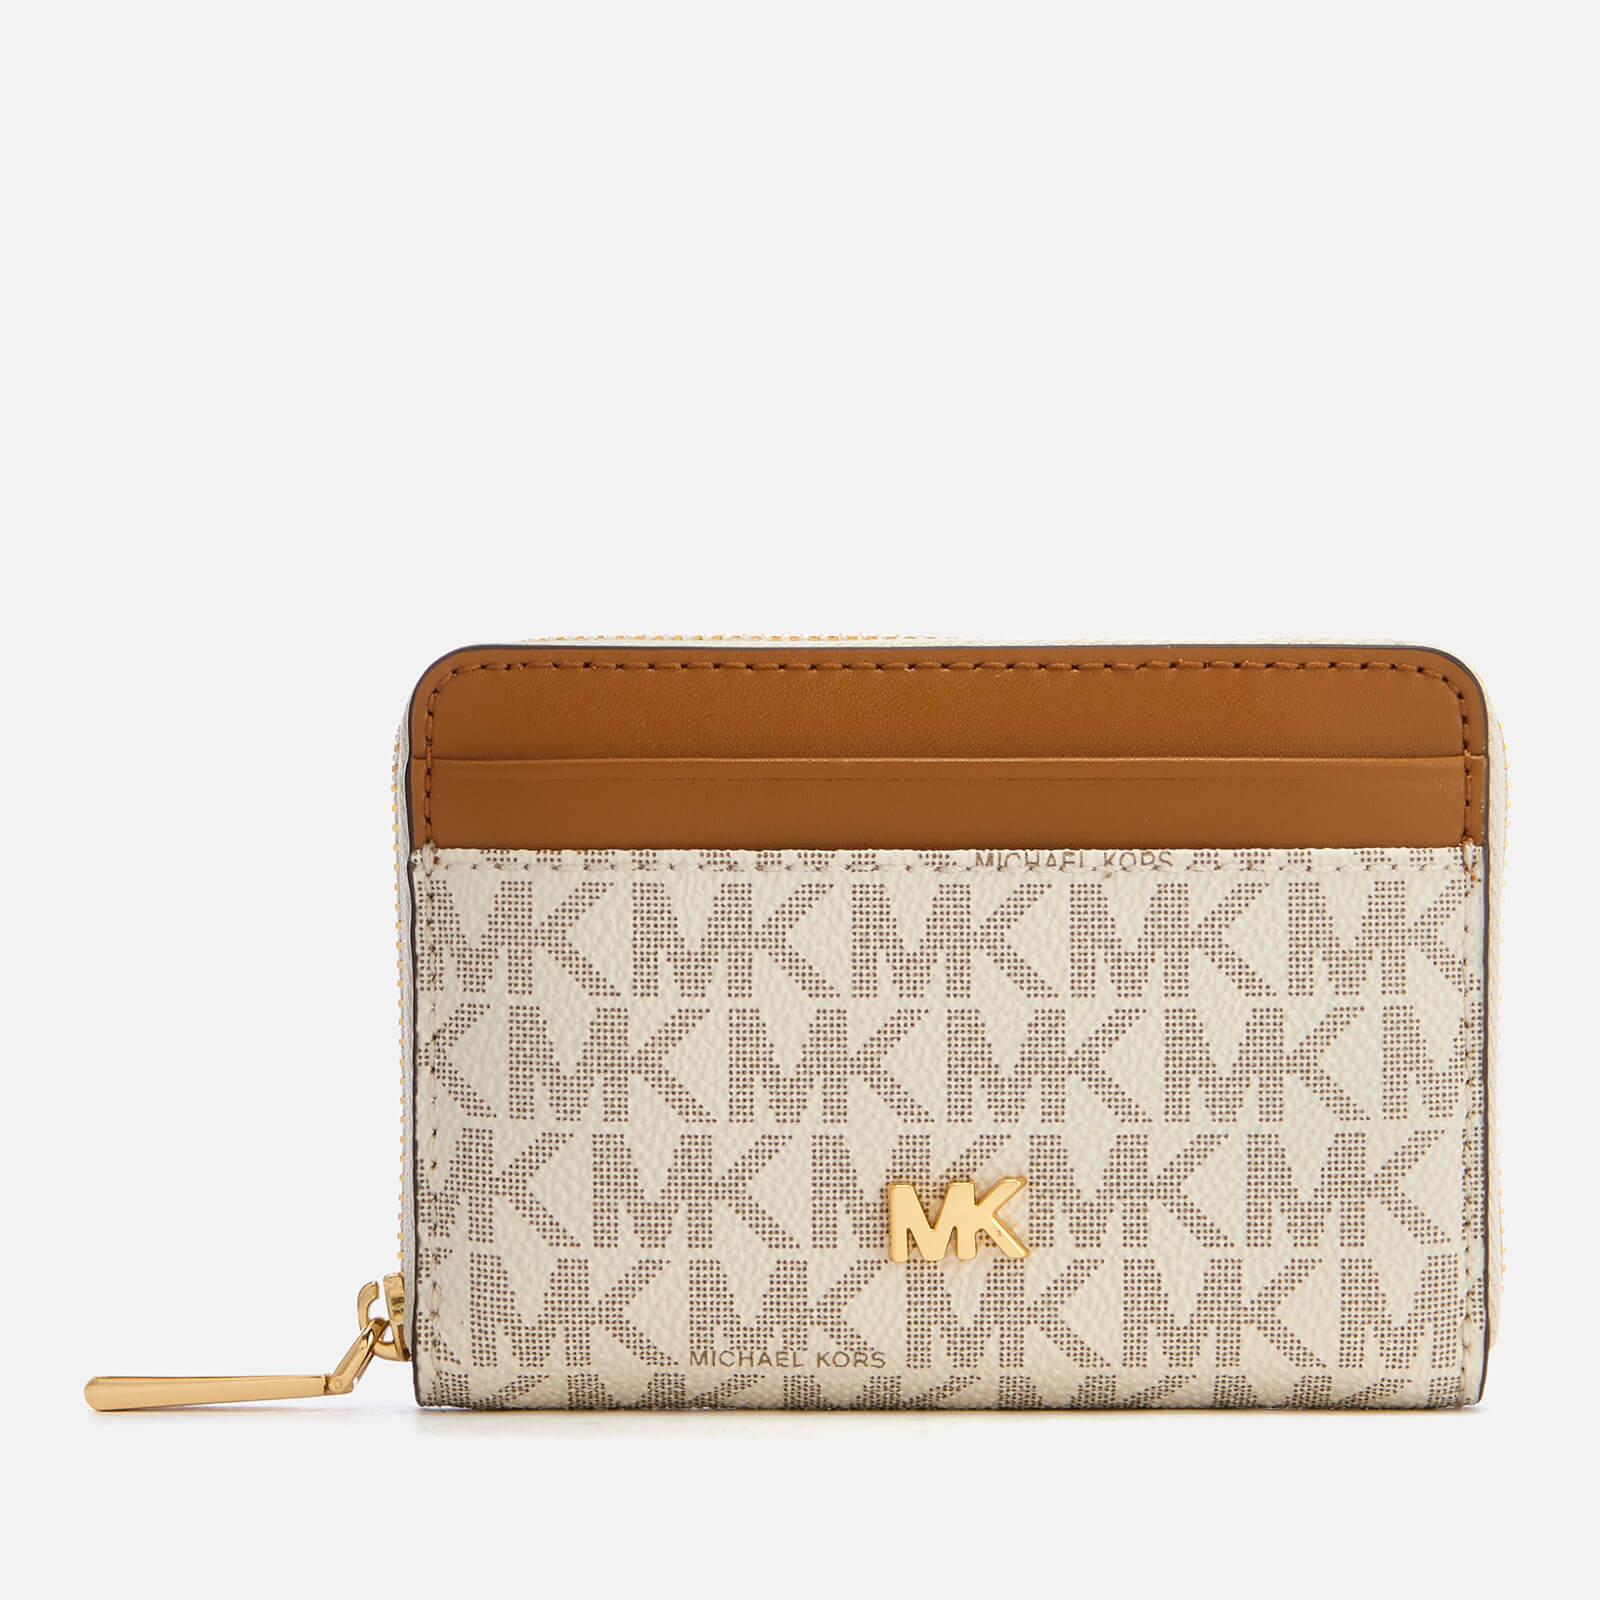 04bdfff430ef MICHAEL MICHAEL KORS Women's Money Pieces Coin Card Case - Vanilla/Acorn  Womens Accessories | TheHut.com